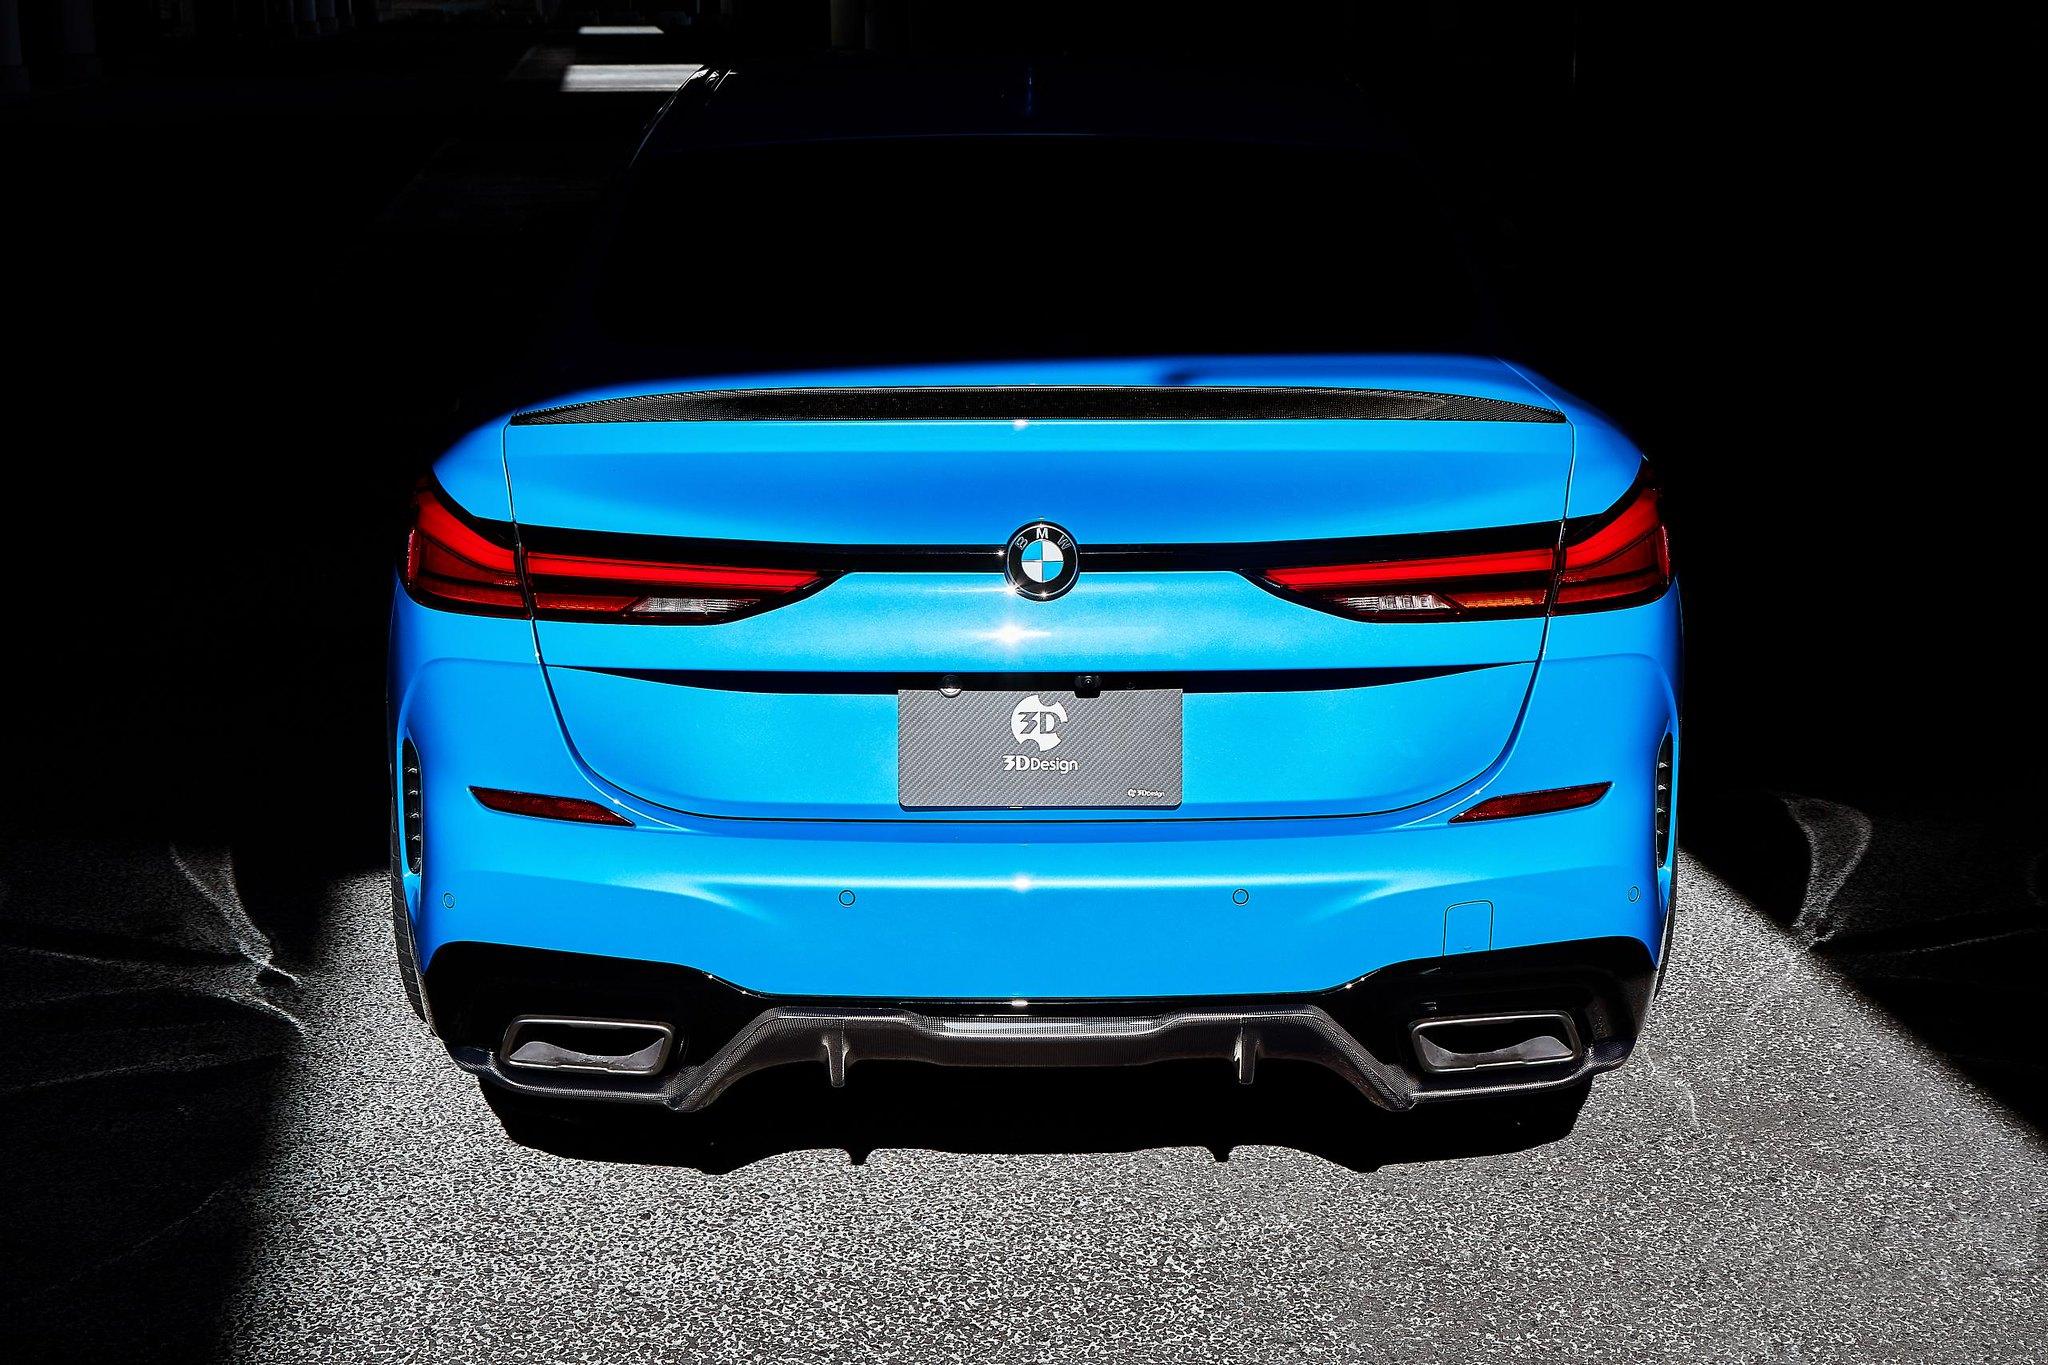 【50%OFF】 3D Design カーボンリアディフューザー 2シリーズ BMW カーボンリアディフューザー F44 2シリーズ M235i M235i, 国産輸入車扱/中古車のケーユー:d953c231 --- kventurepartners.sakura.ne.jp